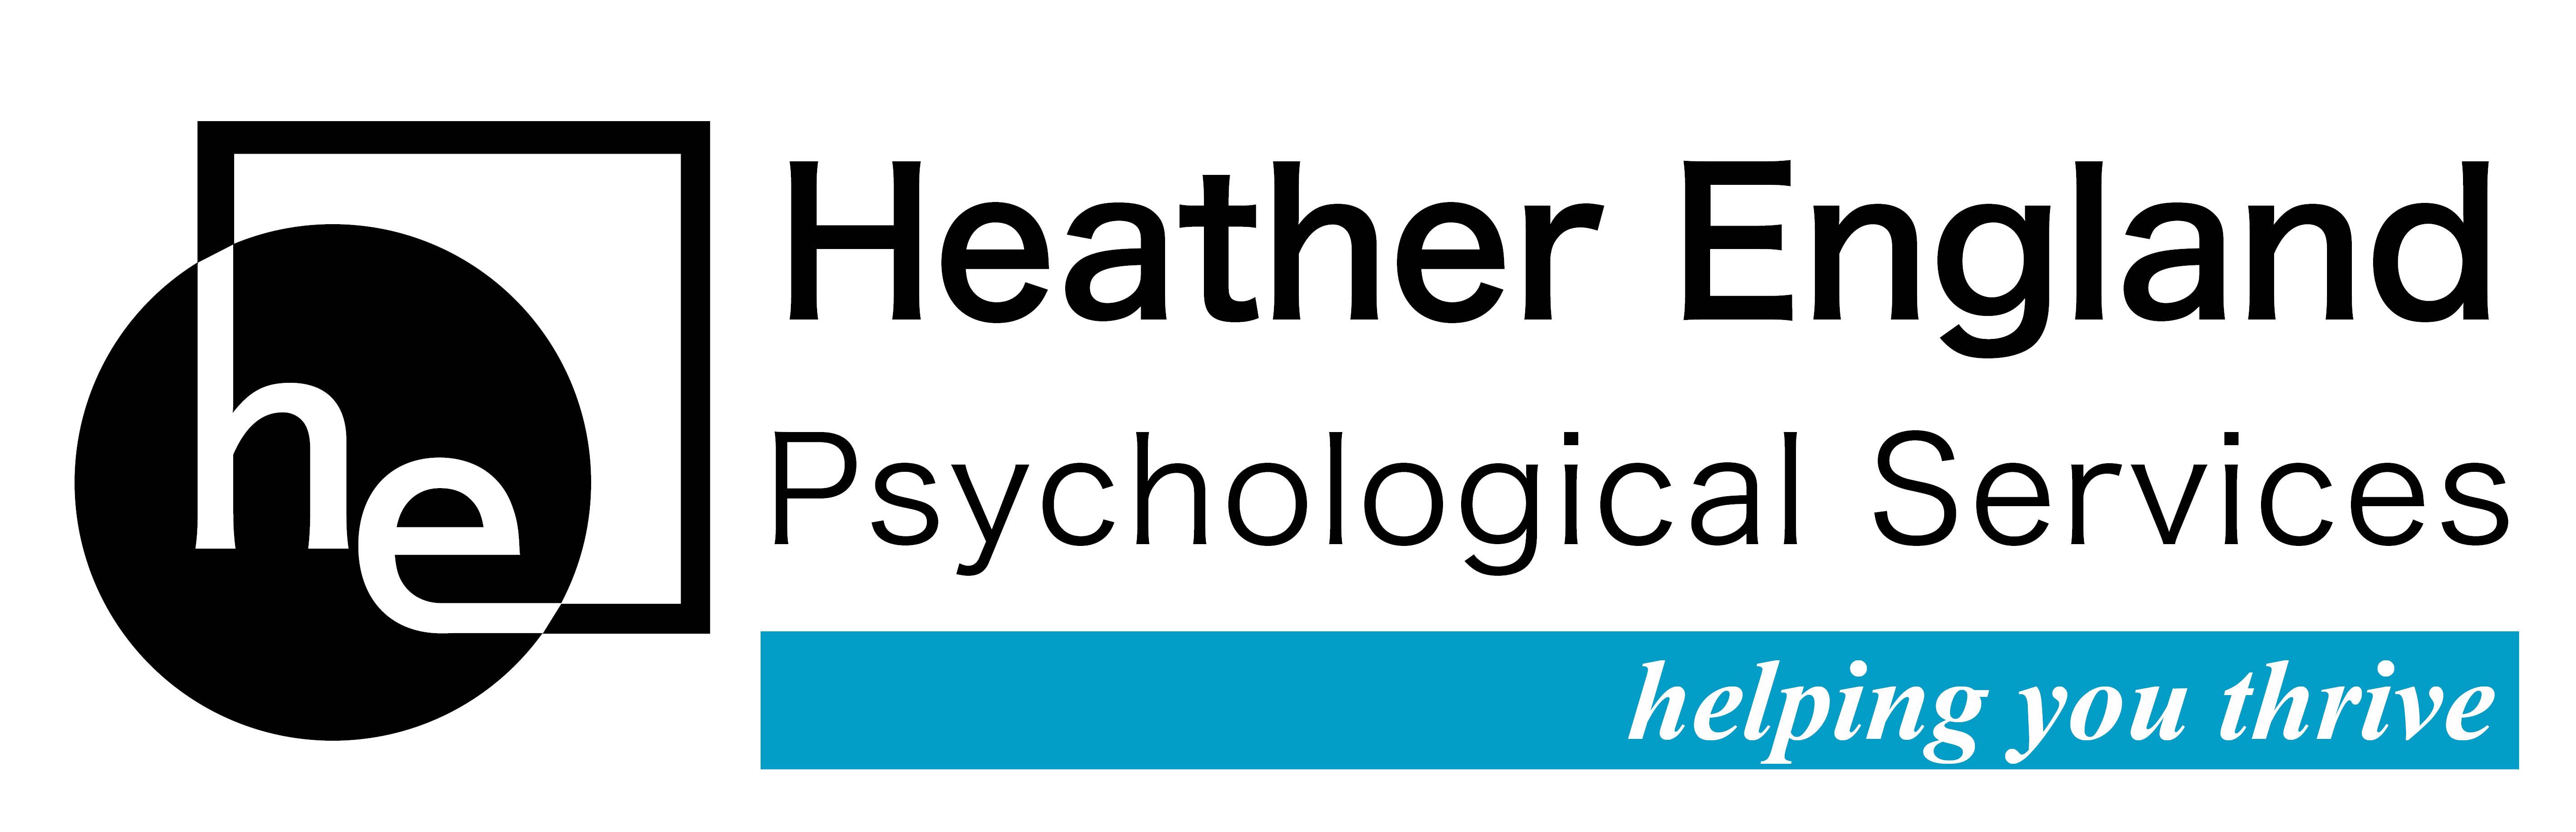 Heather England LLC – Psychological Services